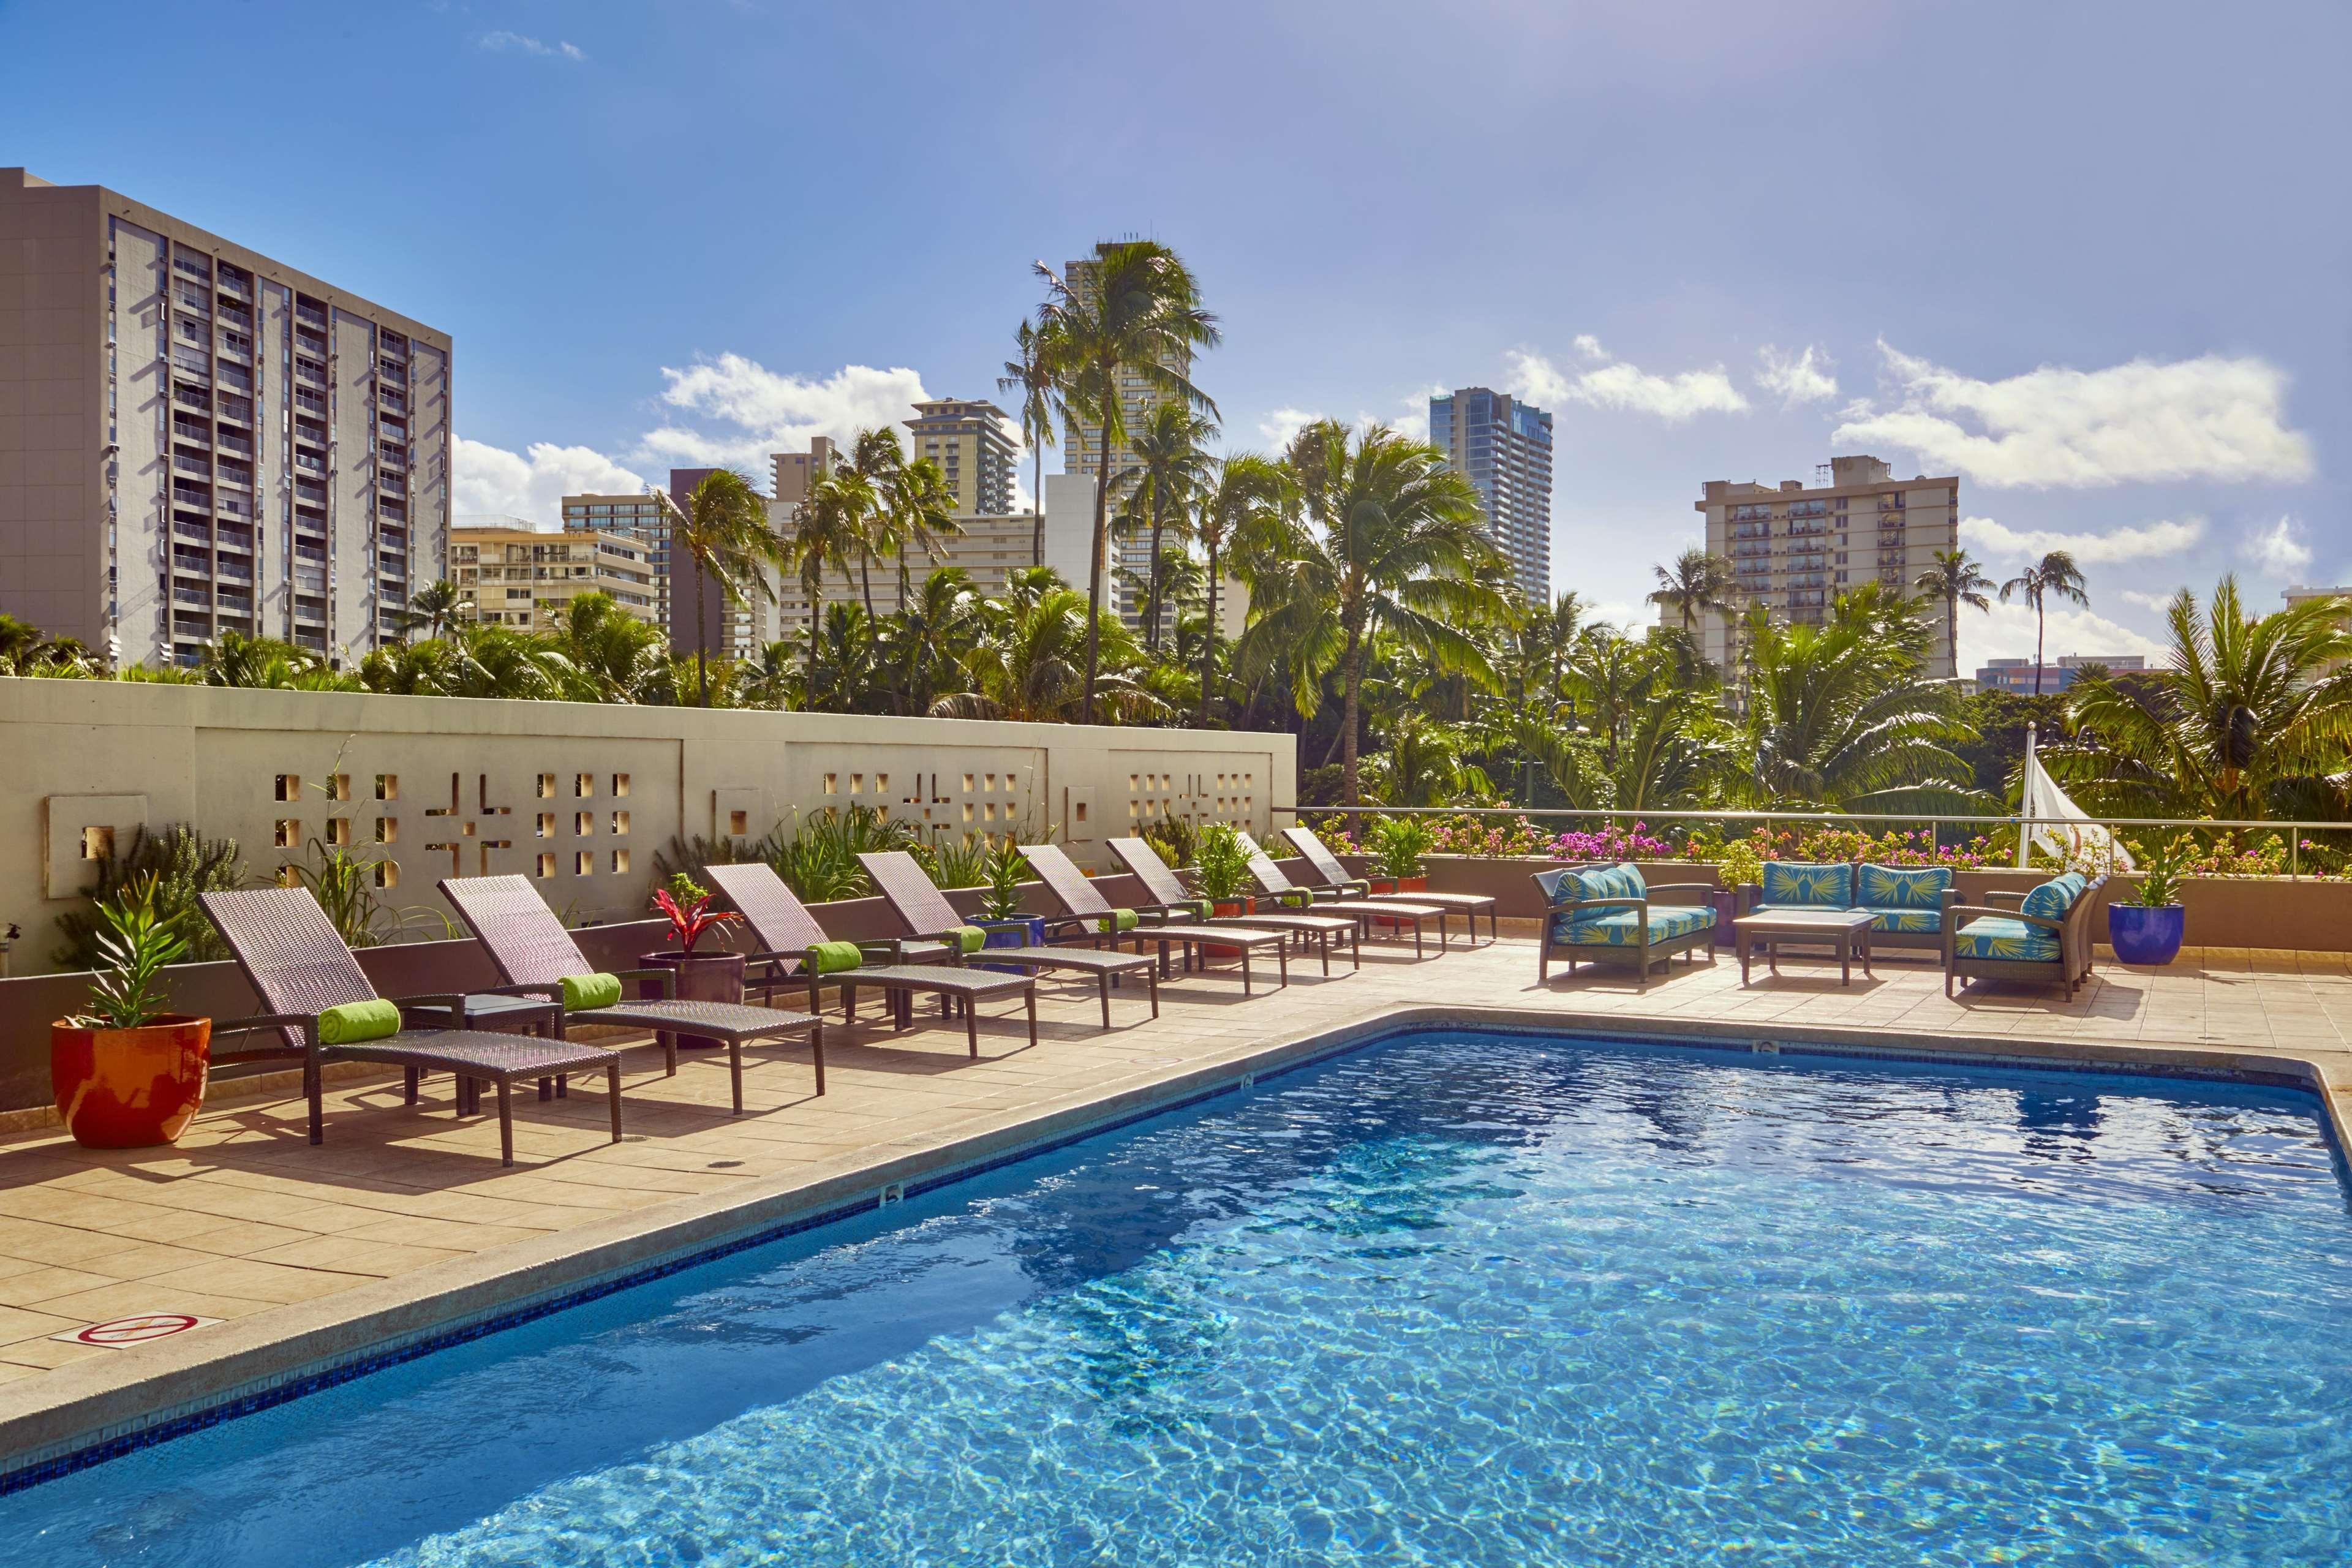 DoubleTree by Hilton Hotel Alana - Waikiki Beach image 4